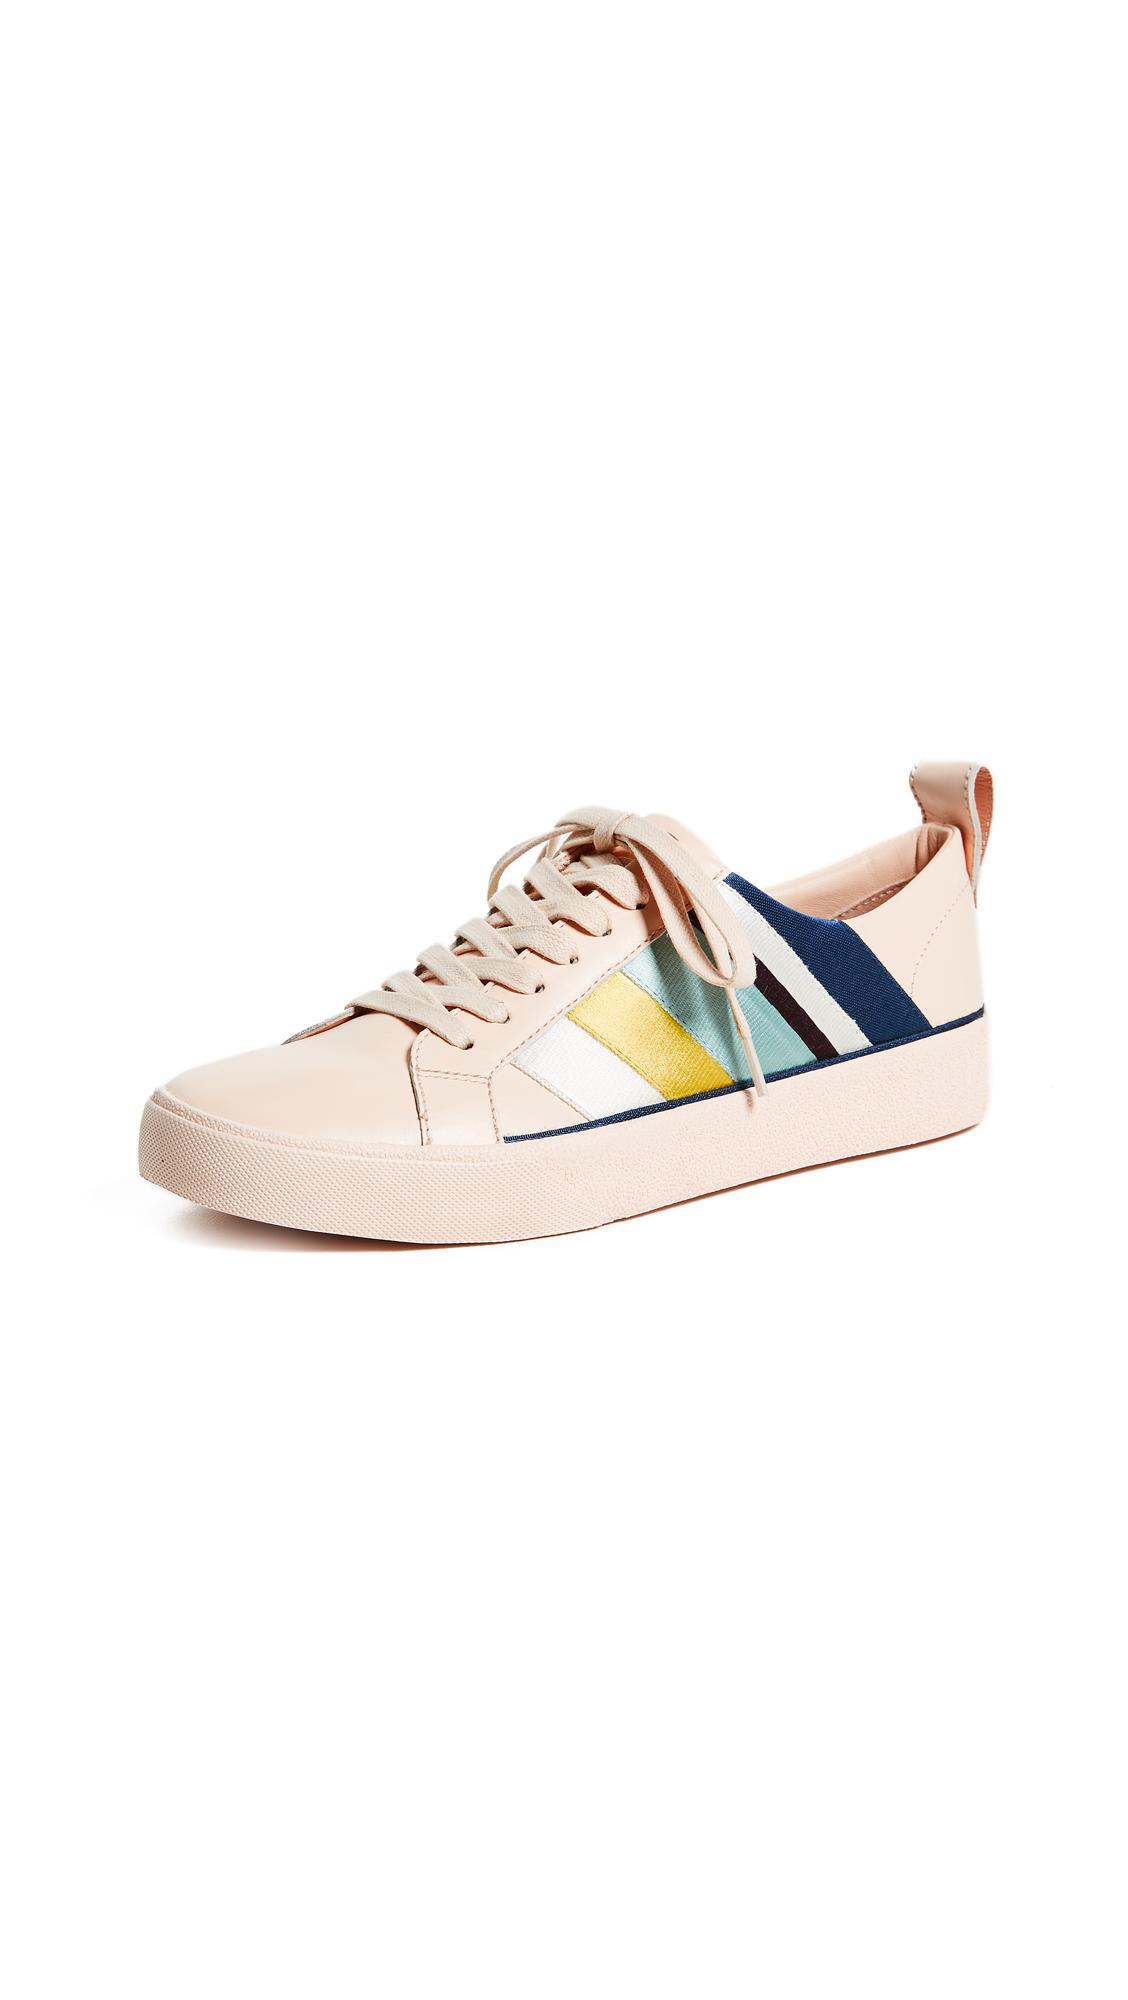 Diane von Furstenberg Tess Sneakers - Melon Multi